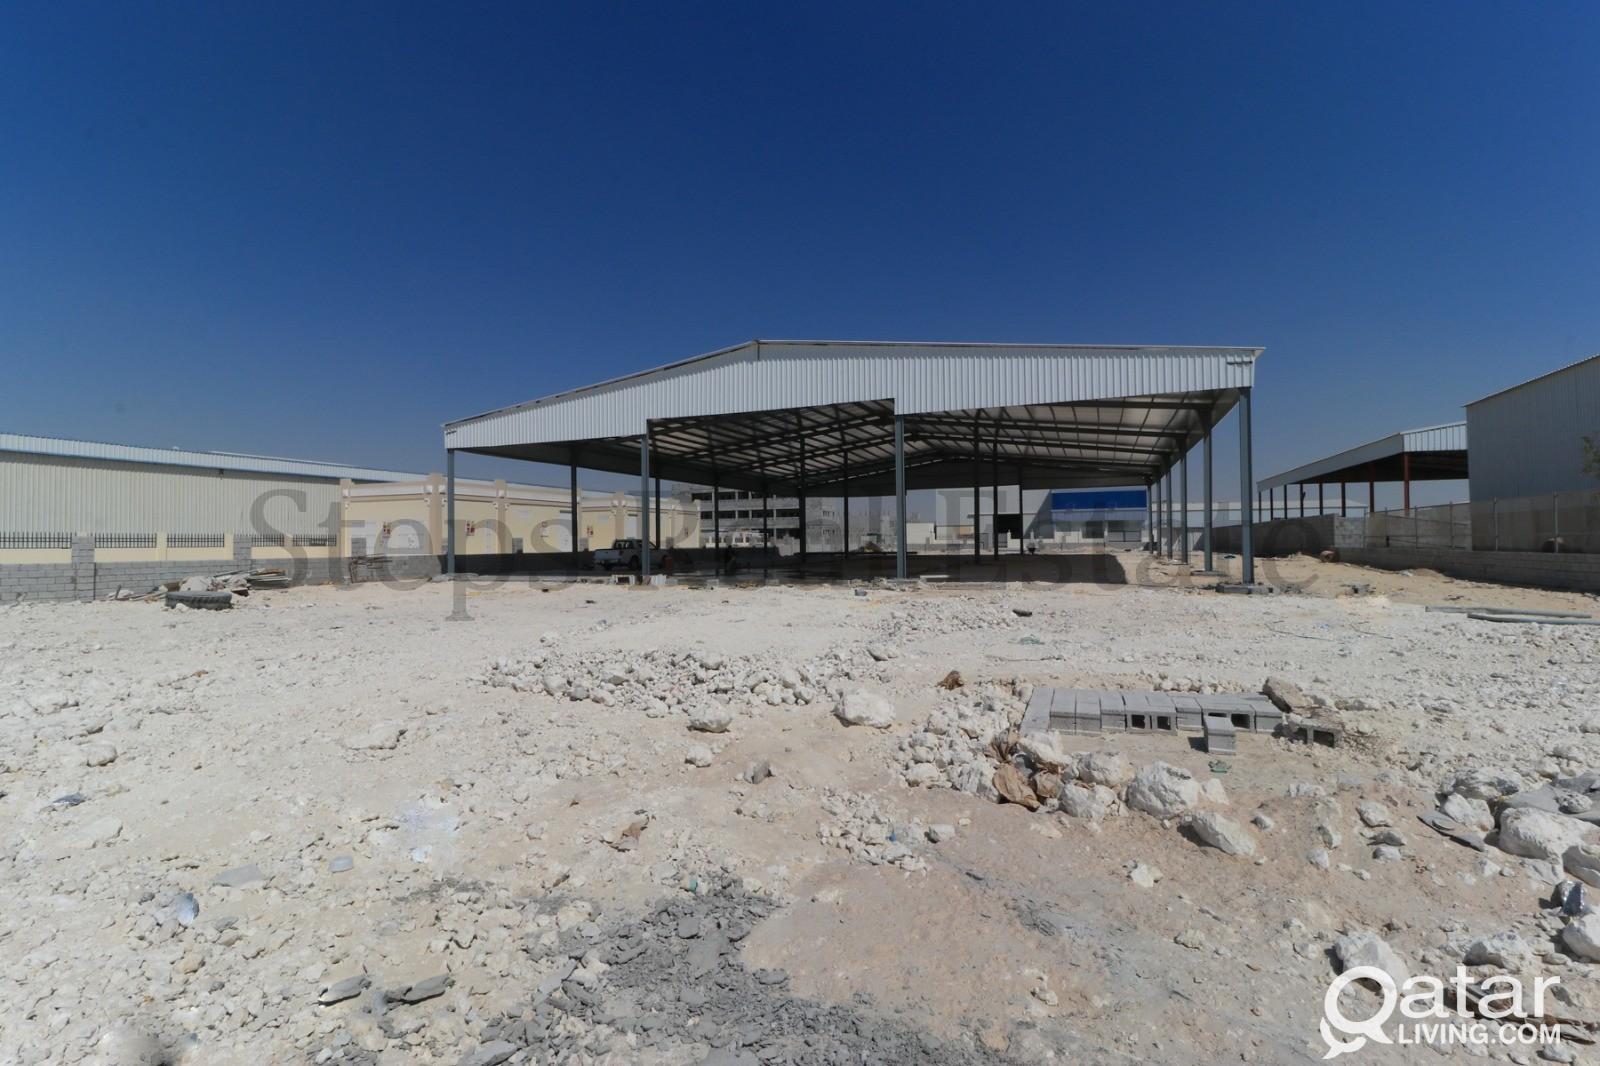 4600 Sqm Warehouse for rent in Barkat Al Awmar